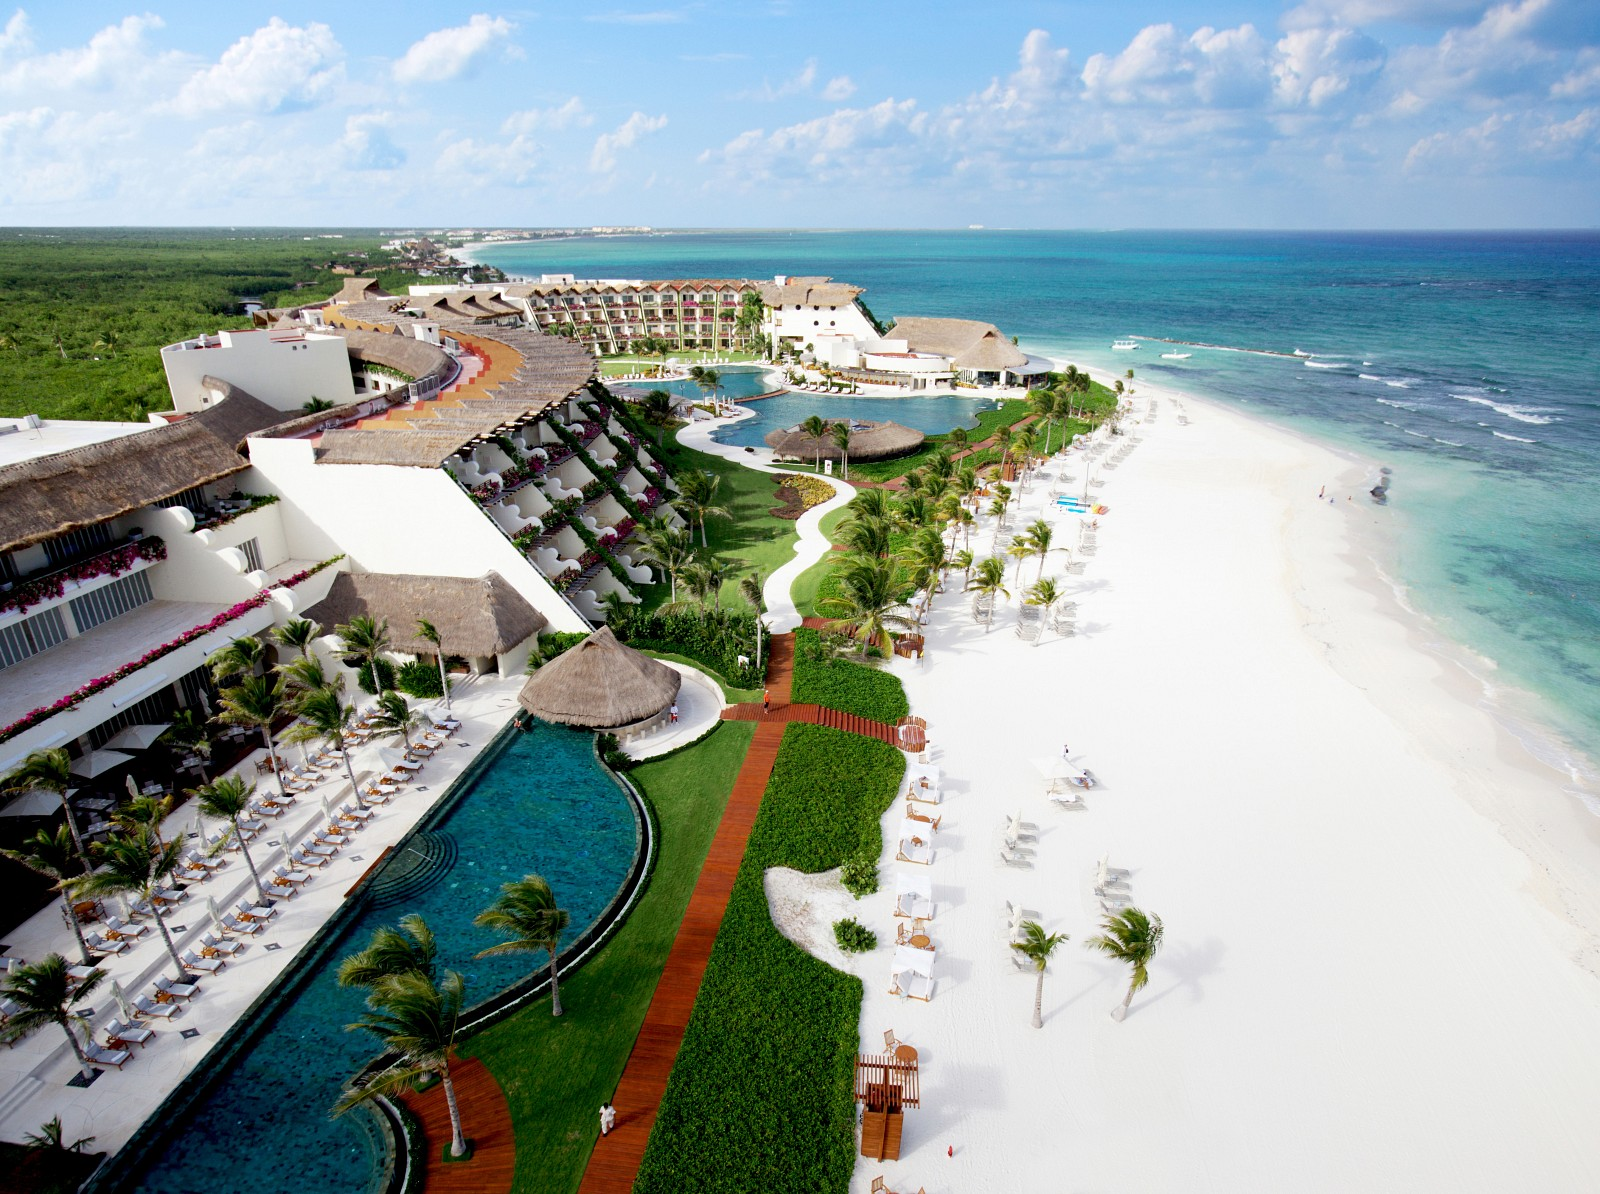 Travel Agency All-Inclusive Resort Grand Velas Riviera Maya 003